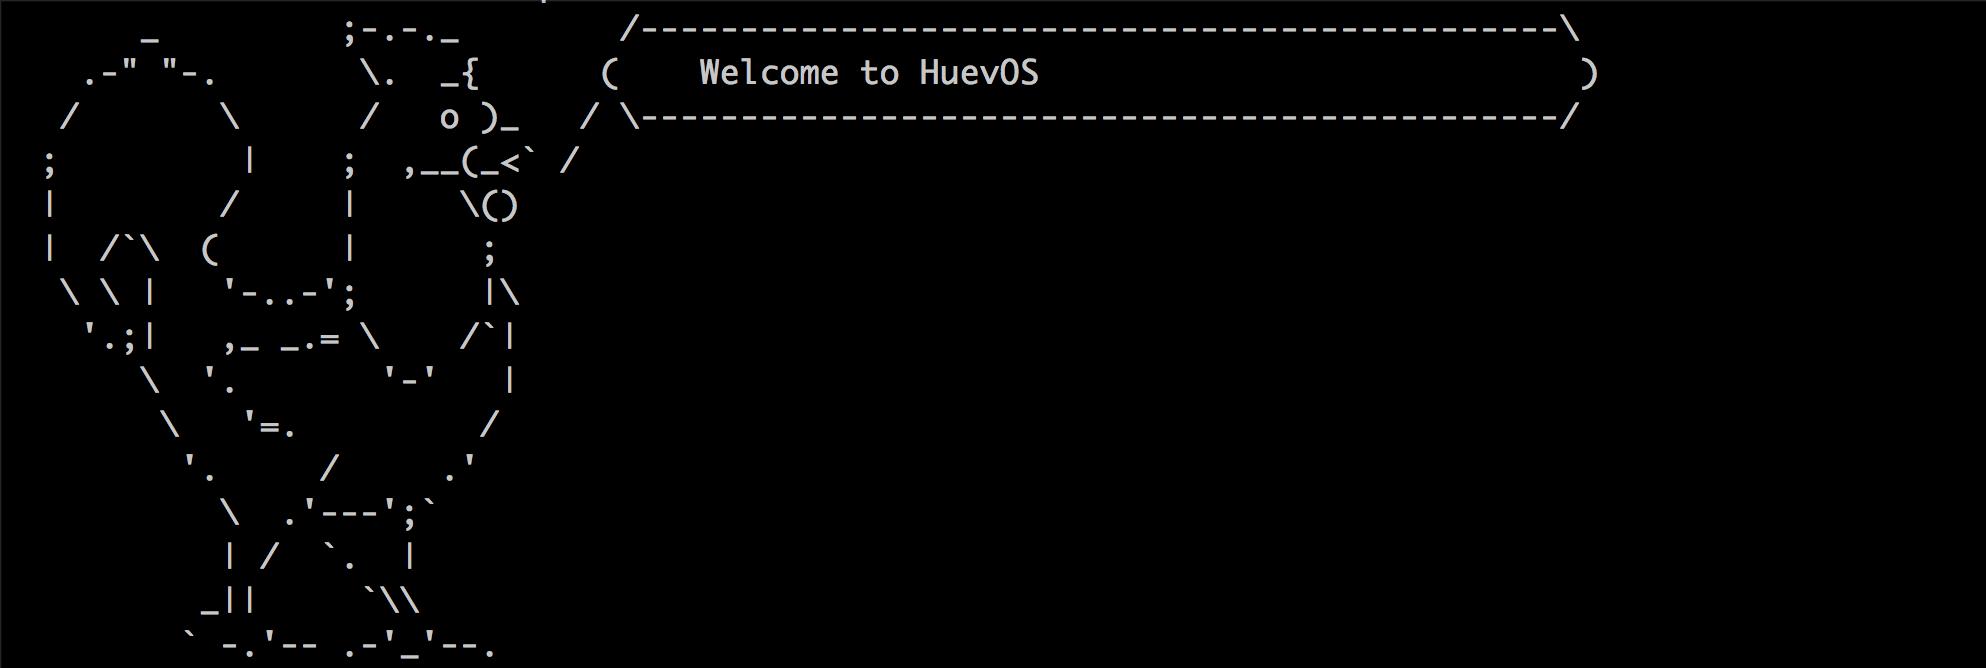 https://testingclouds.files.wordpress.com/2015/02/huevos.png